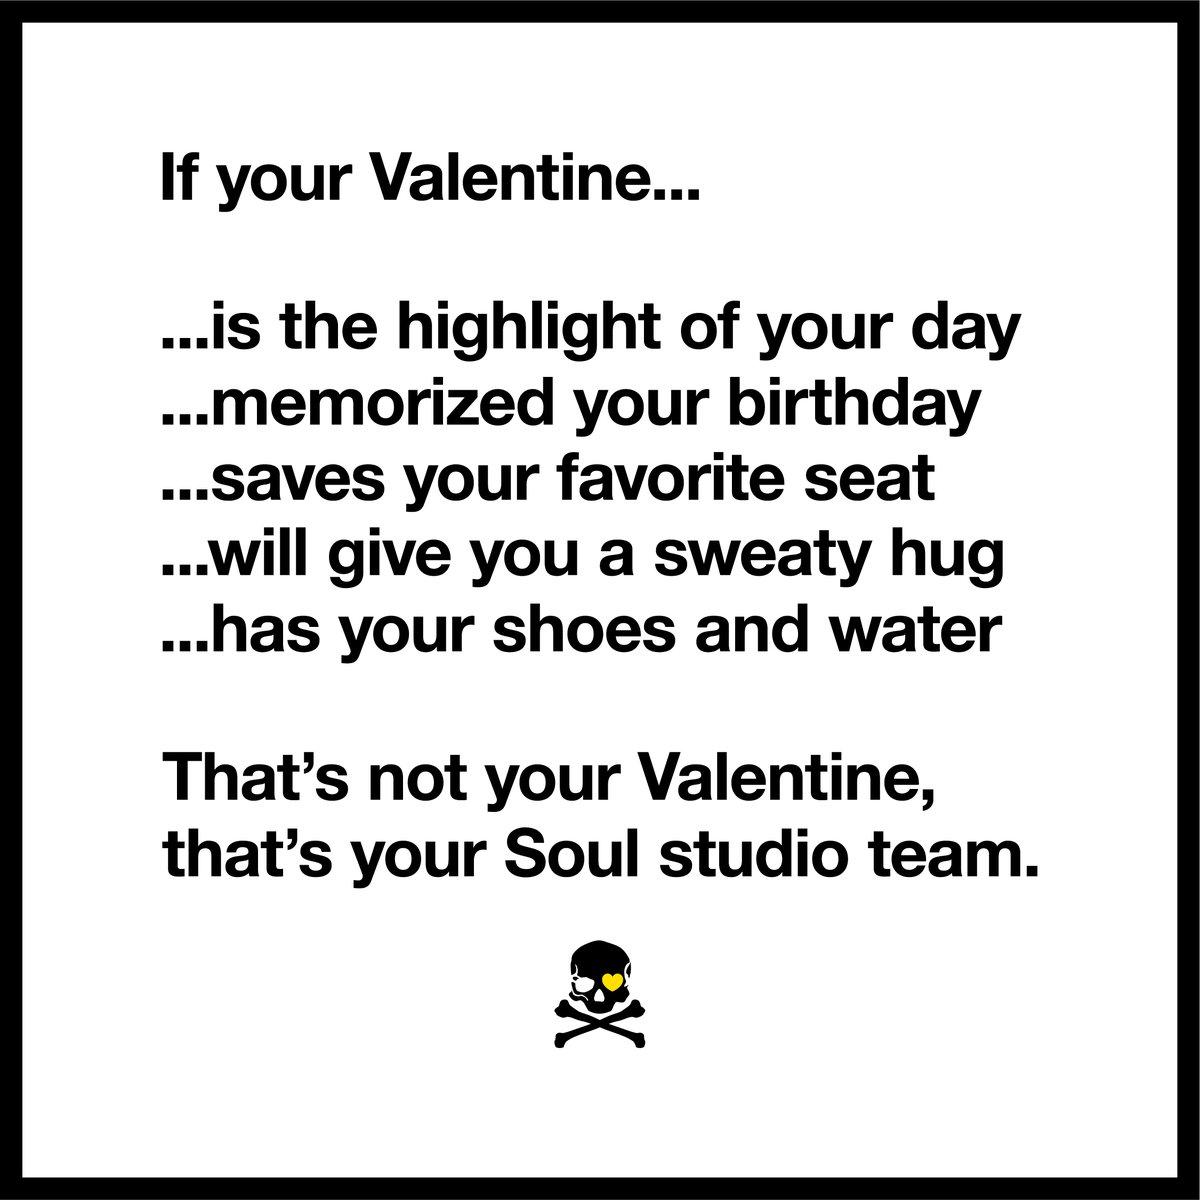 Happy Valentine's Day, #SoulFam 💛 https://t.co/DKNjqeucnF